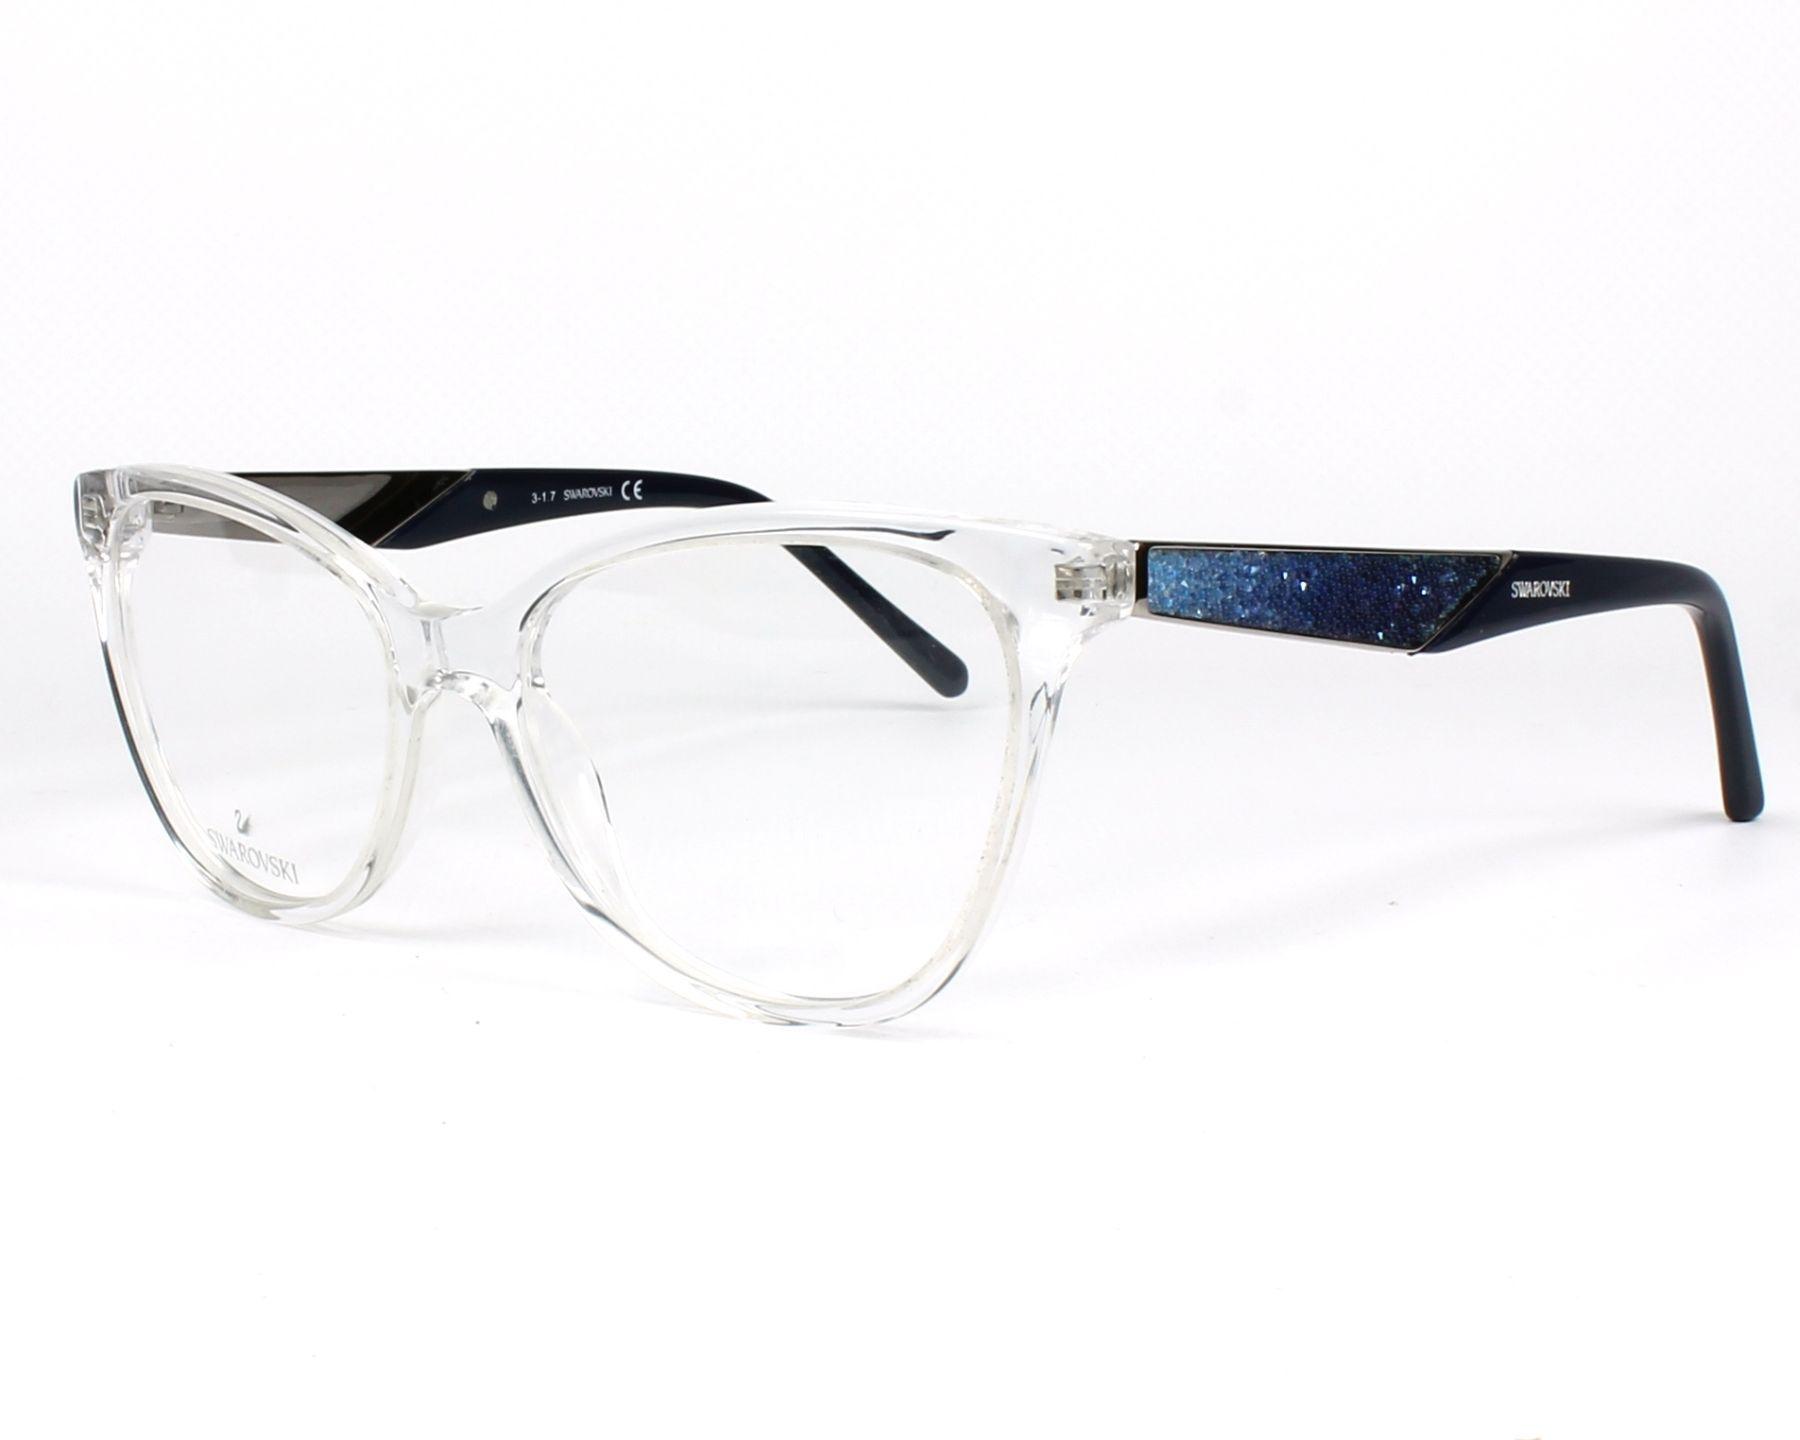 Swarovski Eyeglasses SK-5224 026 Crystal | visio-net.com